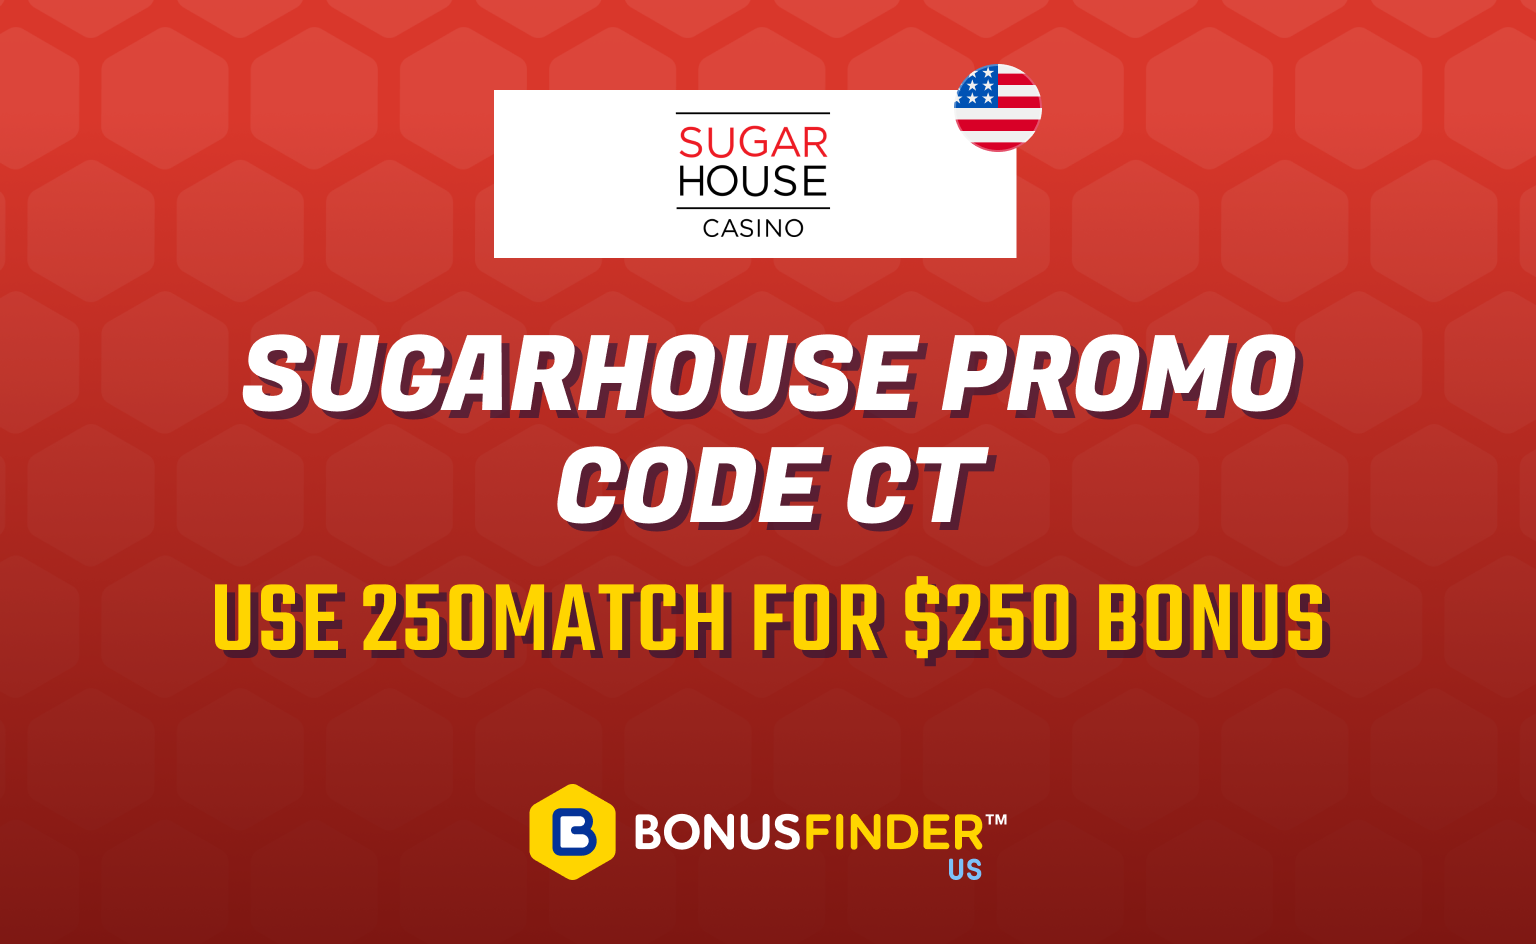 sugarhouse promo code connecticut